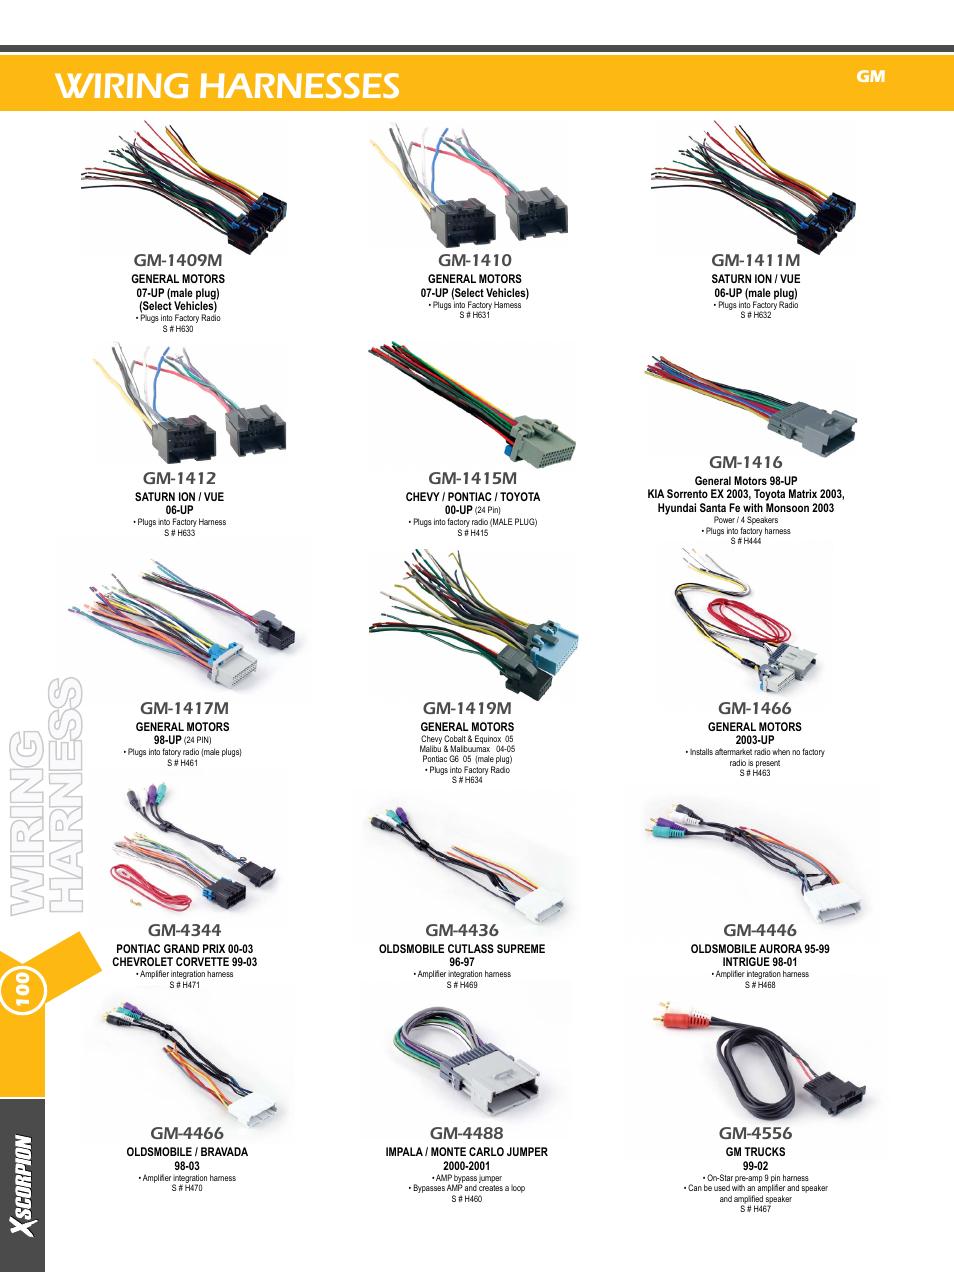 xscorpion dash kit harness and antenna catalog page100 wiring harnesses, gm 4344, gm 1415m xscorpion dash kit, harness xscorpion wire harness at bakdesigns.co